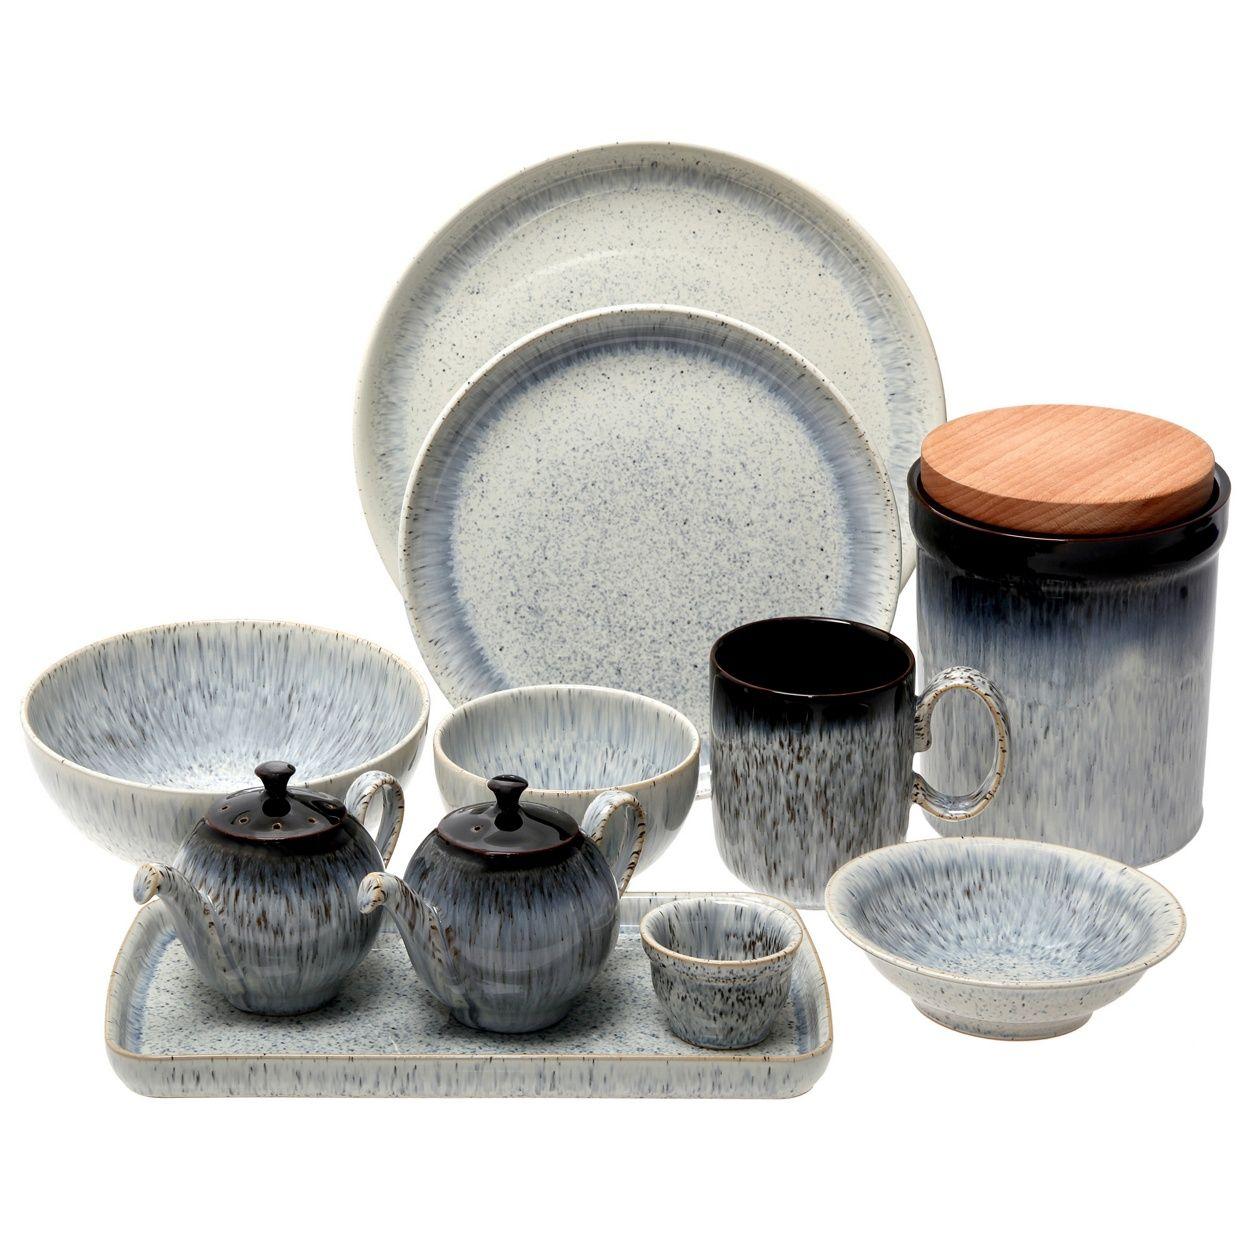 Denby \u0027Halo\u0027 dinner plate - Plates - Dinnerware - Home \u0026 furniture -  sc 1 st  Pinterest & Denby Denby \u0027Halo\u0027 side plate- at Debenhams.com | Ceramics/Crockery ...